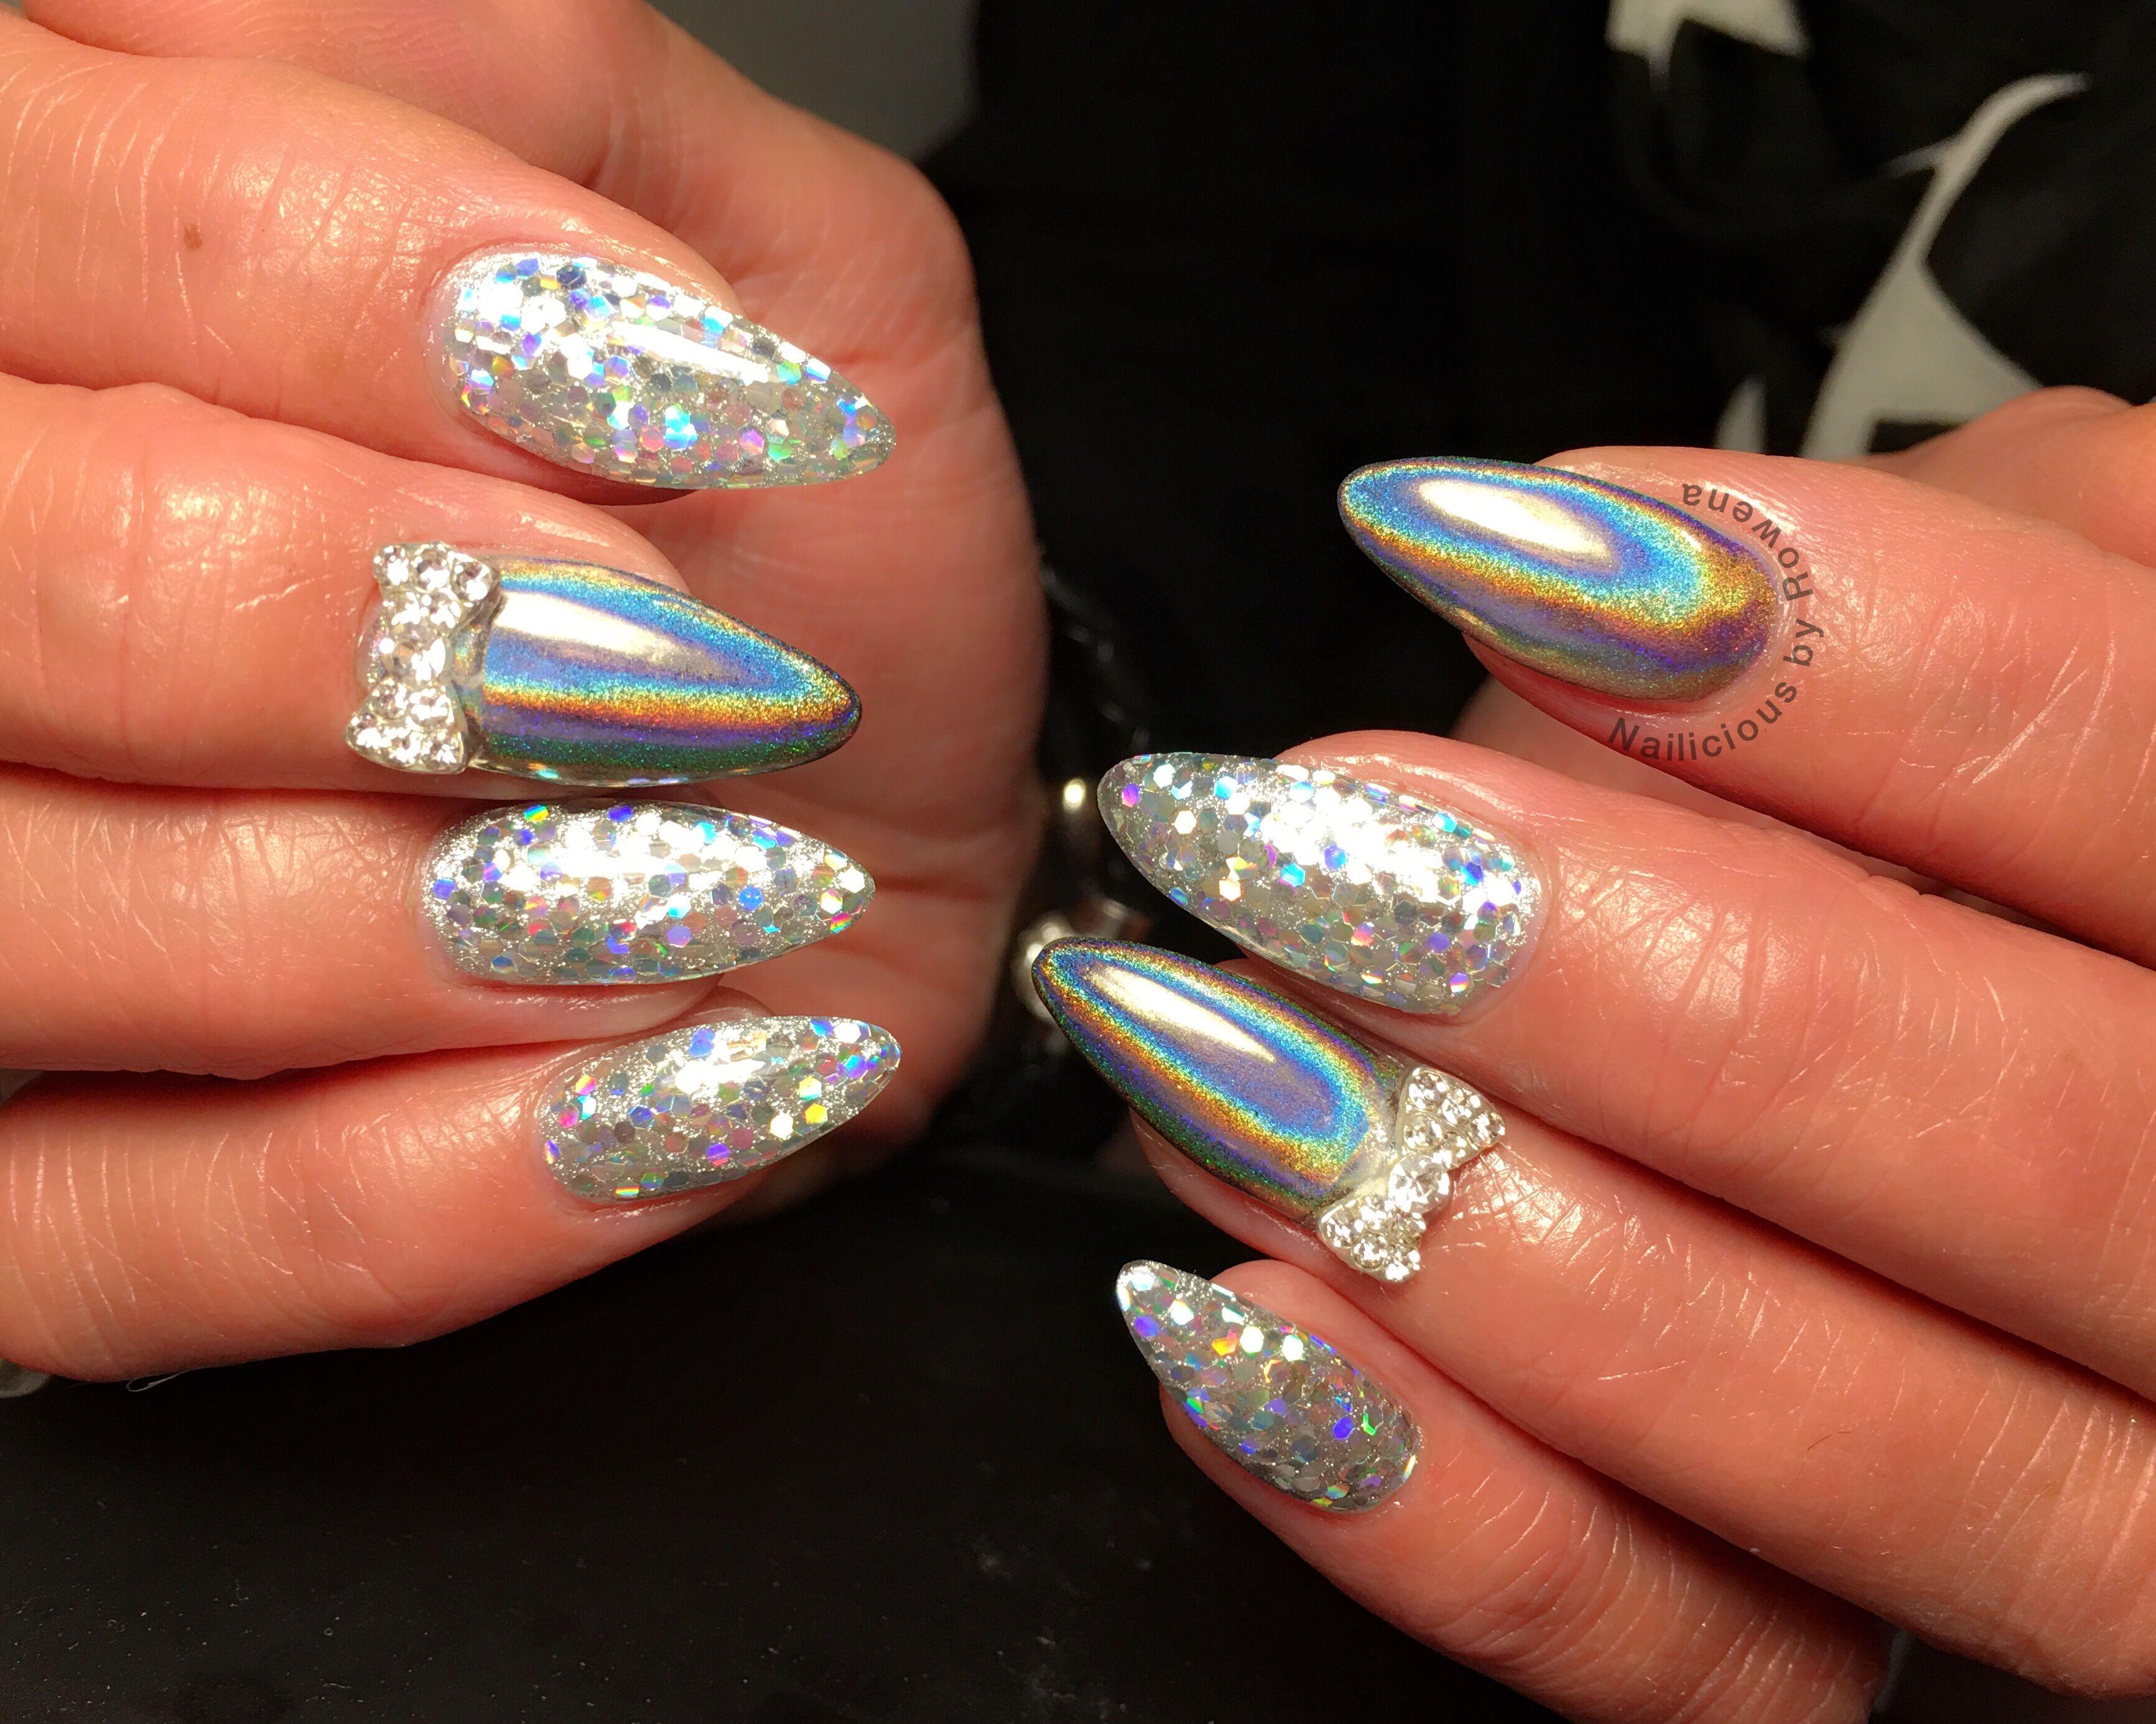 Holografic nails aka unicorn | Nailicious by me/like | Pinterest ...